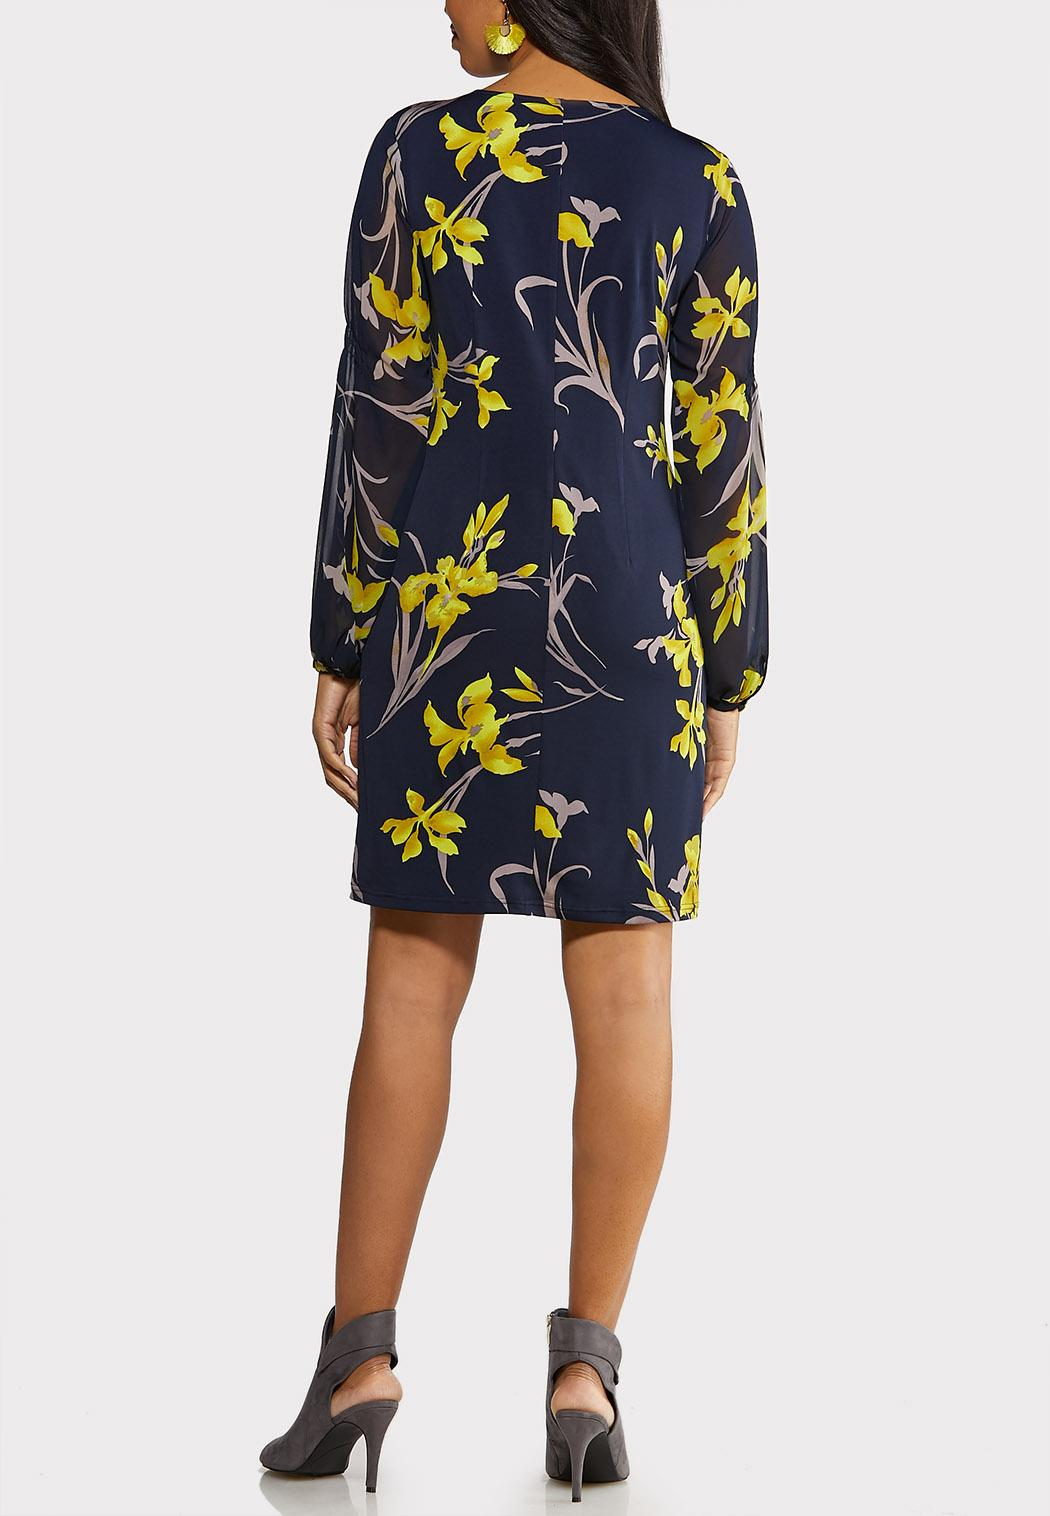 Plus Size Sheer Sleeve Swing Dress (Item #44110374)